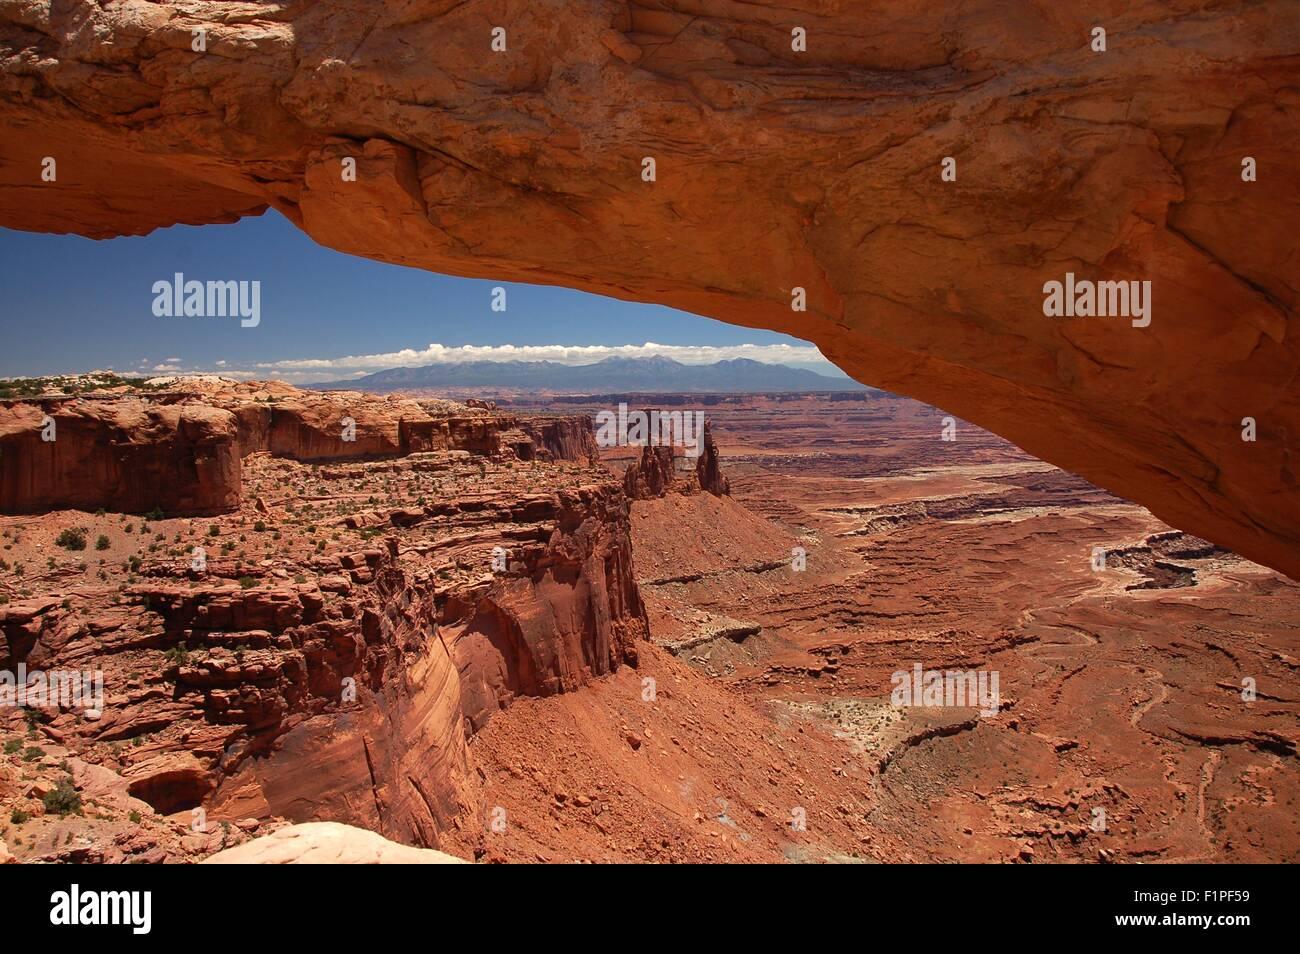 Arches Park and Canyonland, Utah USA. Utah Landscapes. - Stock Image